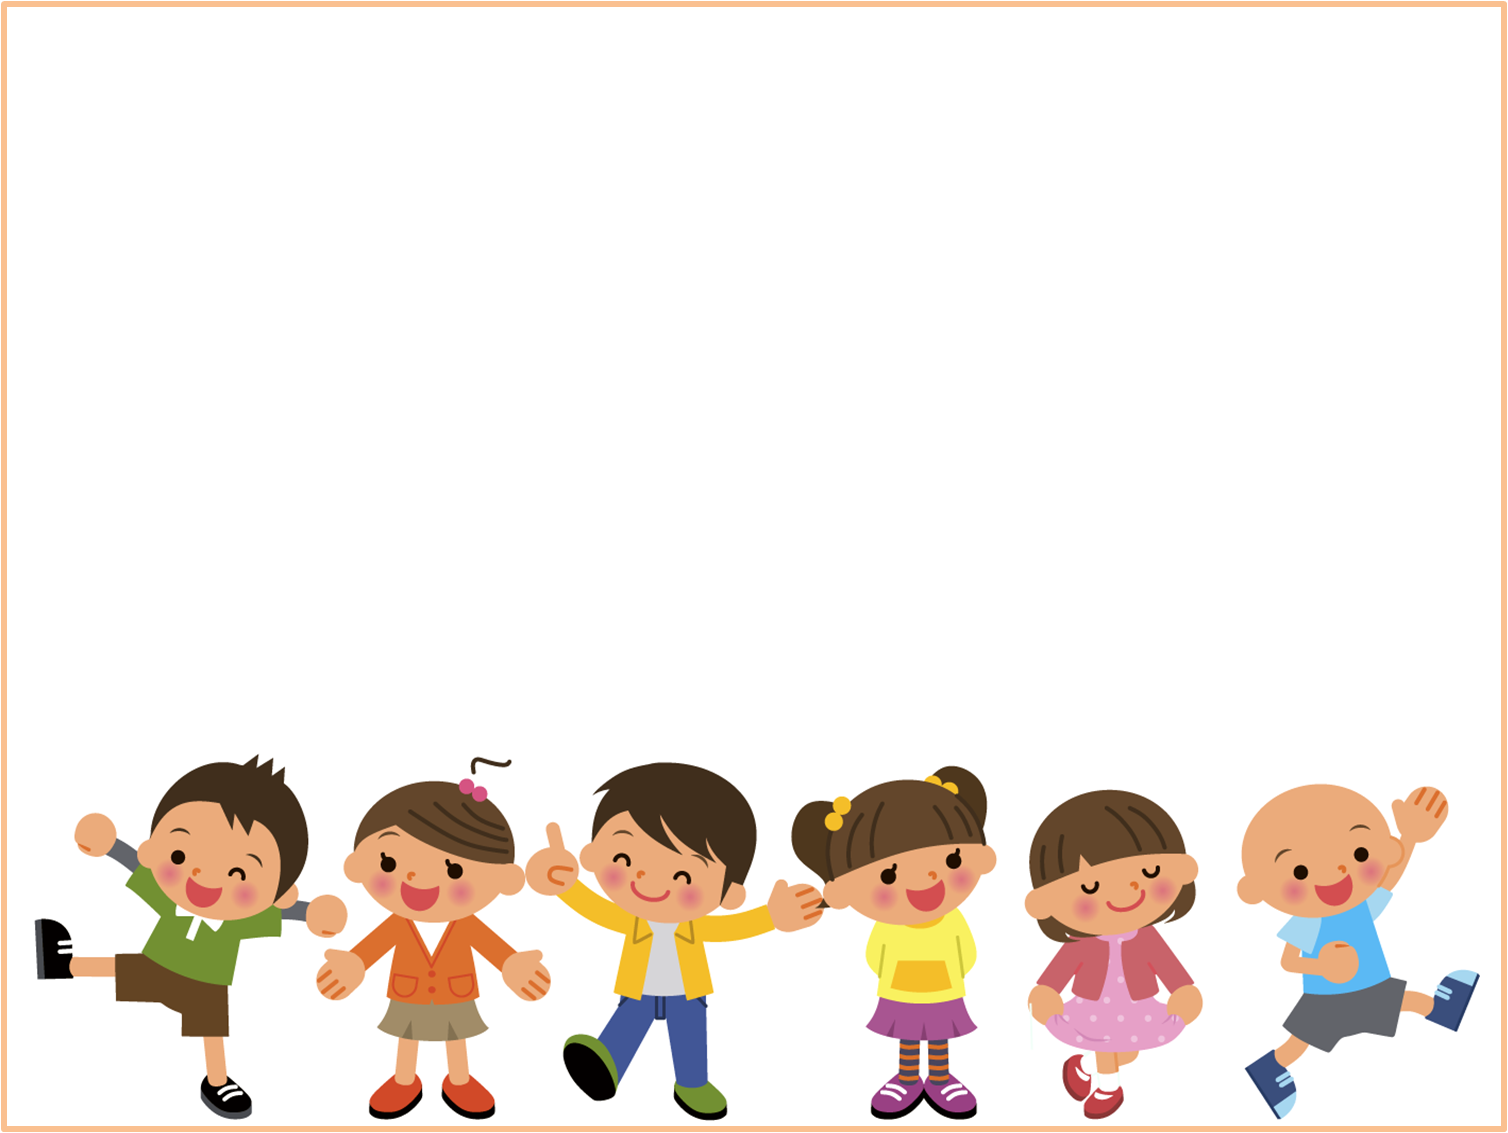 Шаблоны для презентаций powerpoint детские игры